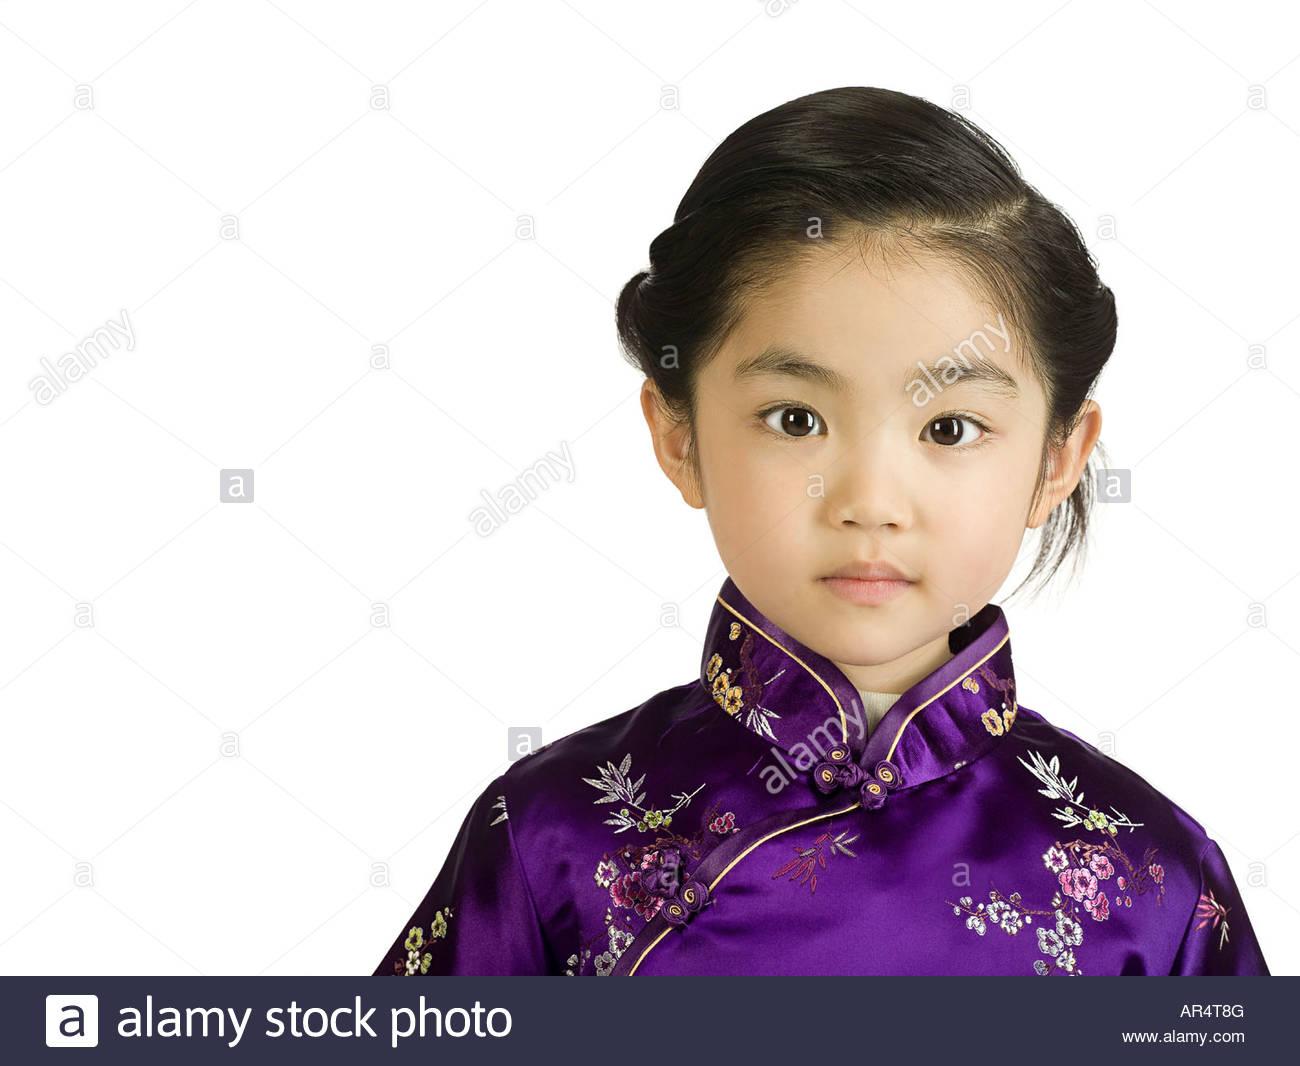 Chinese girl - Stock Image